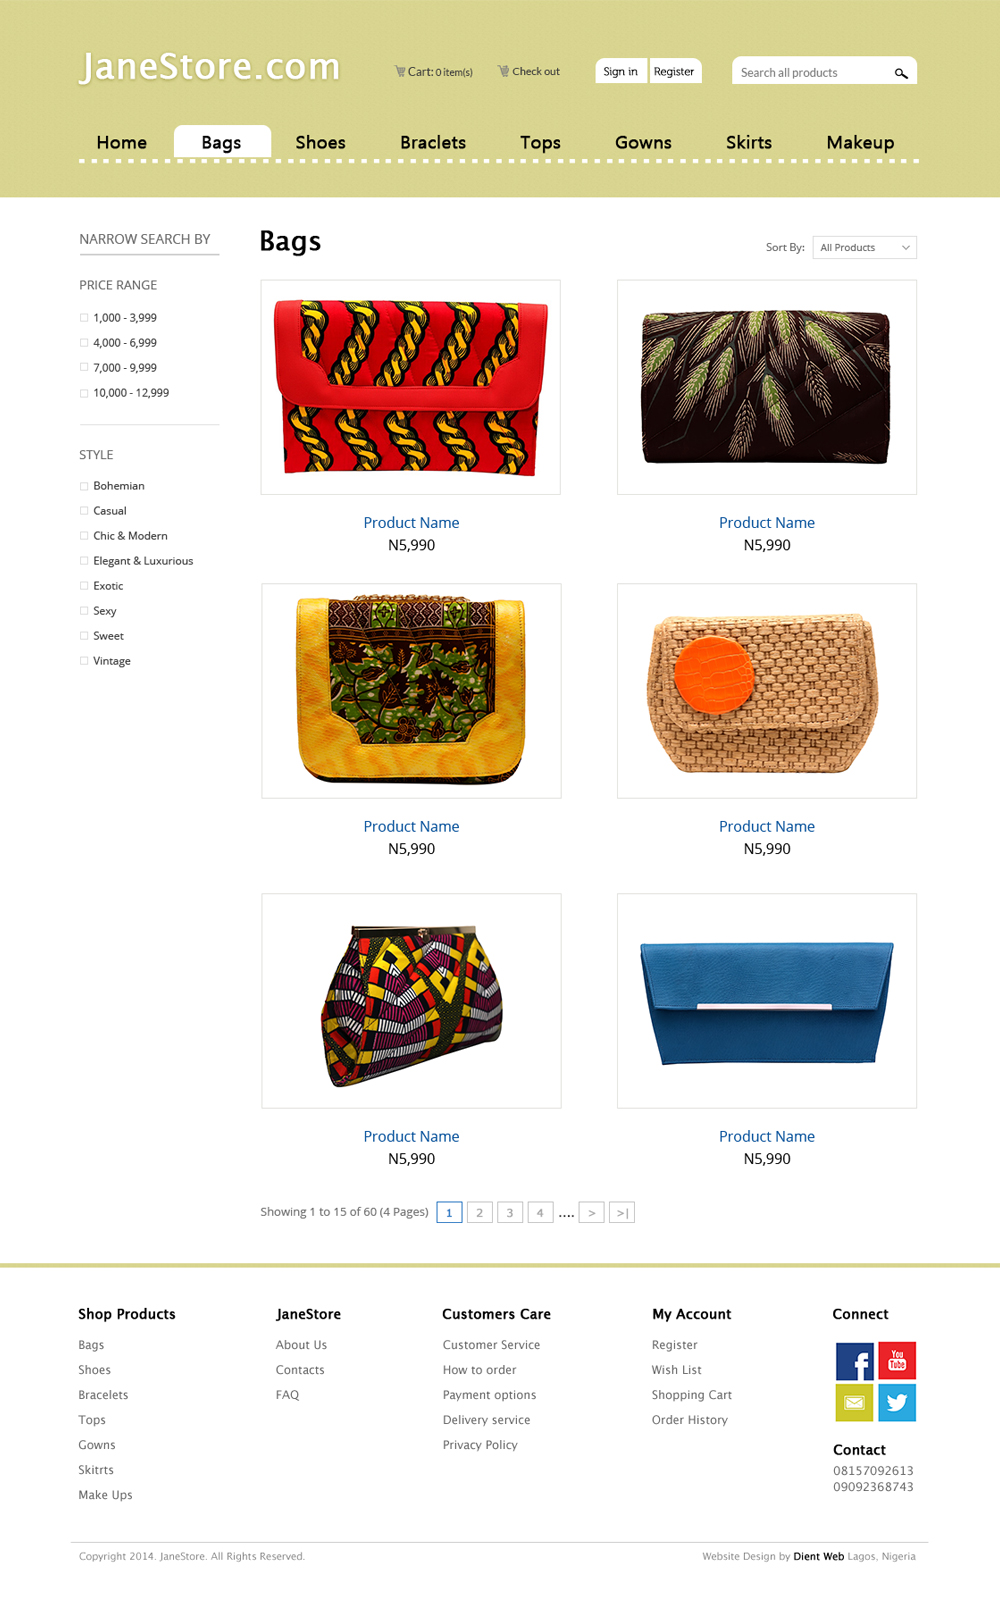 ecommerce website design - Janestore category page design